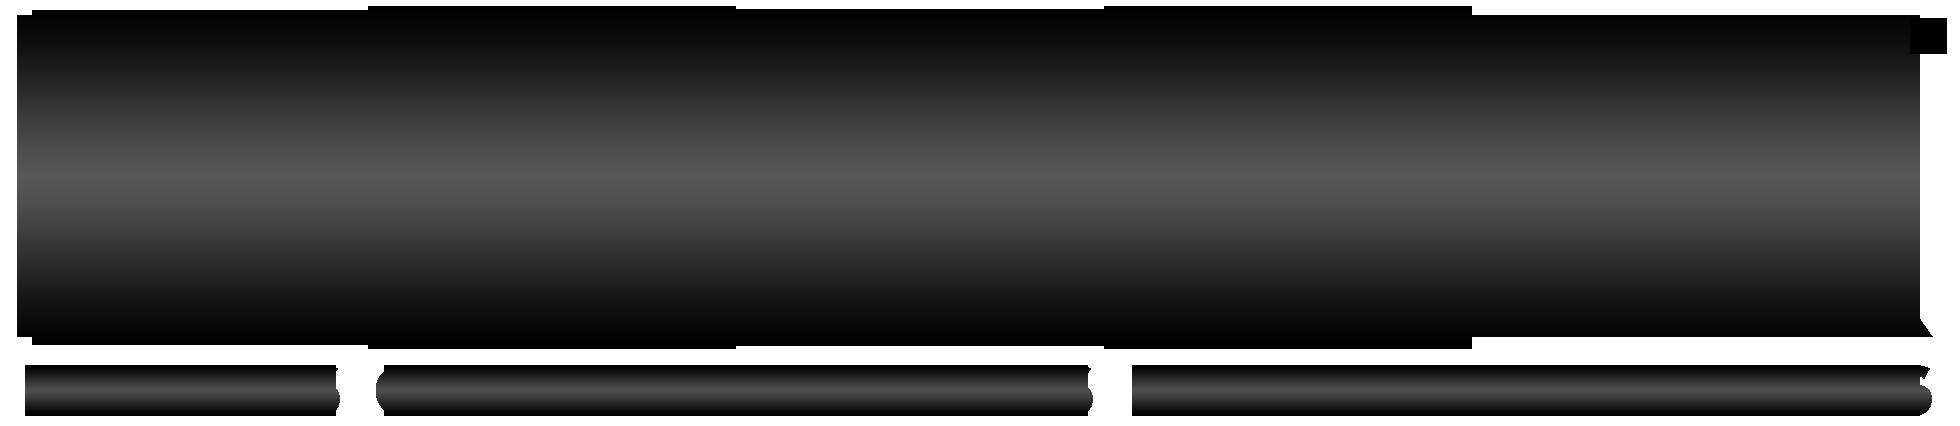 locbox logo